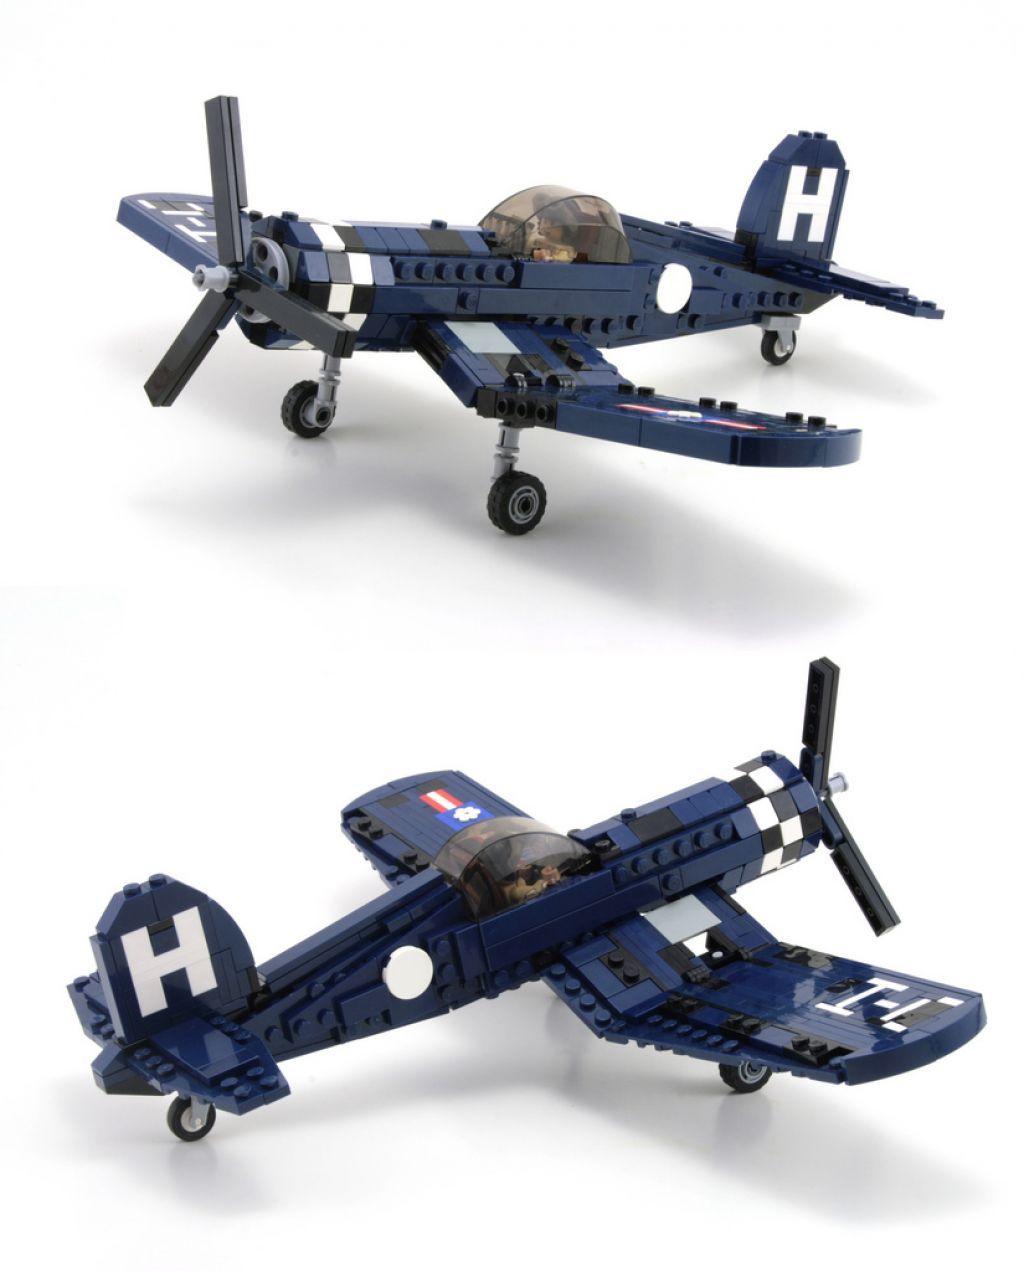 lego aircraft1 Lego Air Force